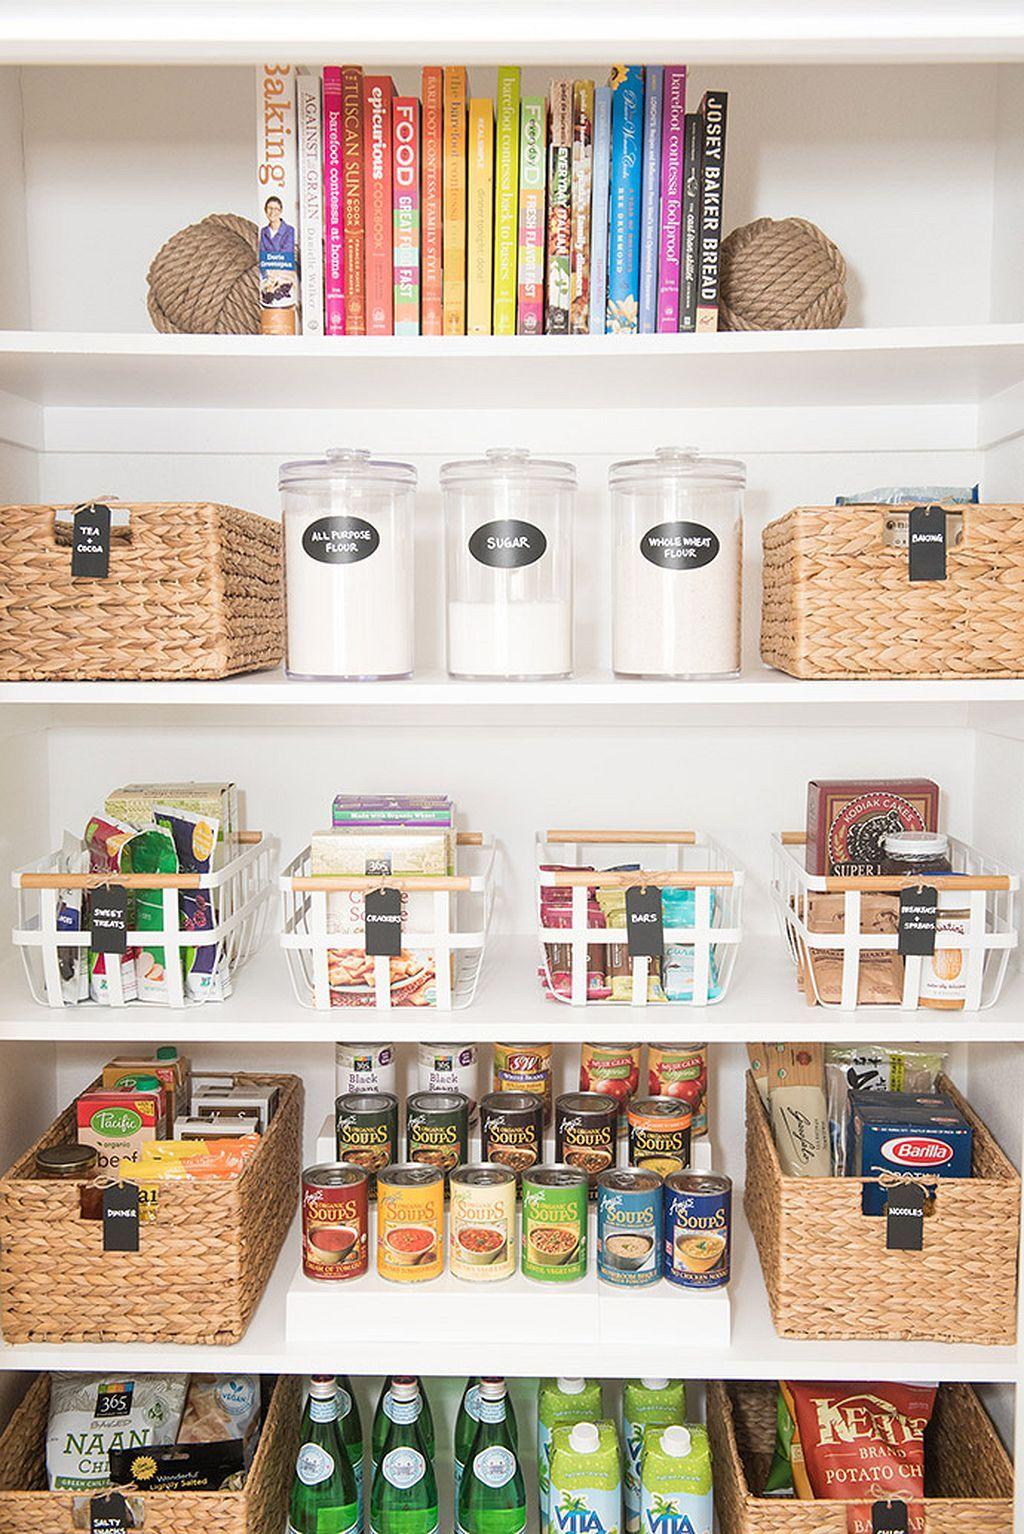 Awesome 60 Pantry Organization Ideas   Future home ideas   Pinterest ...